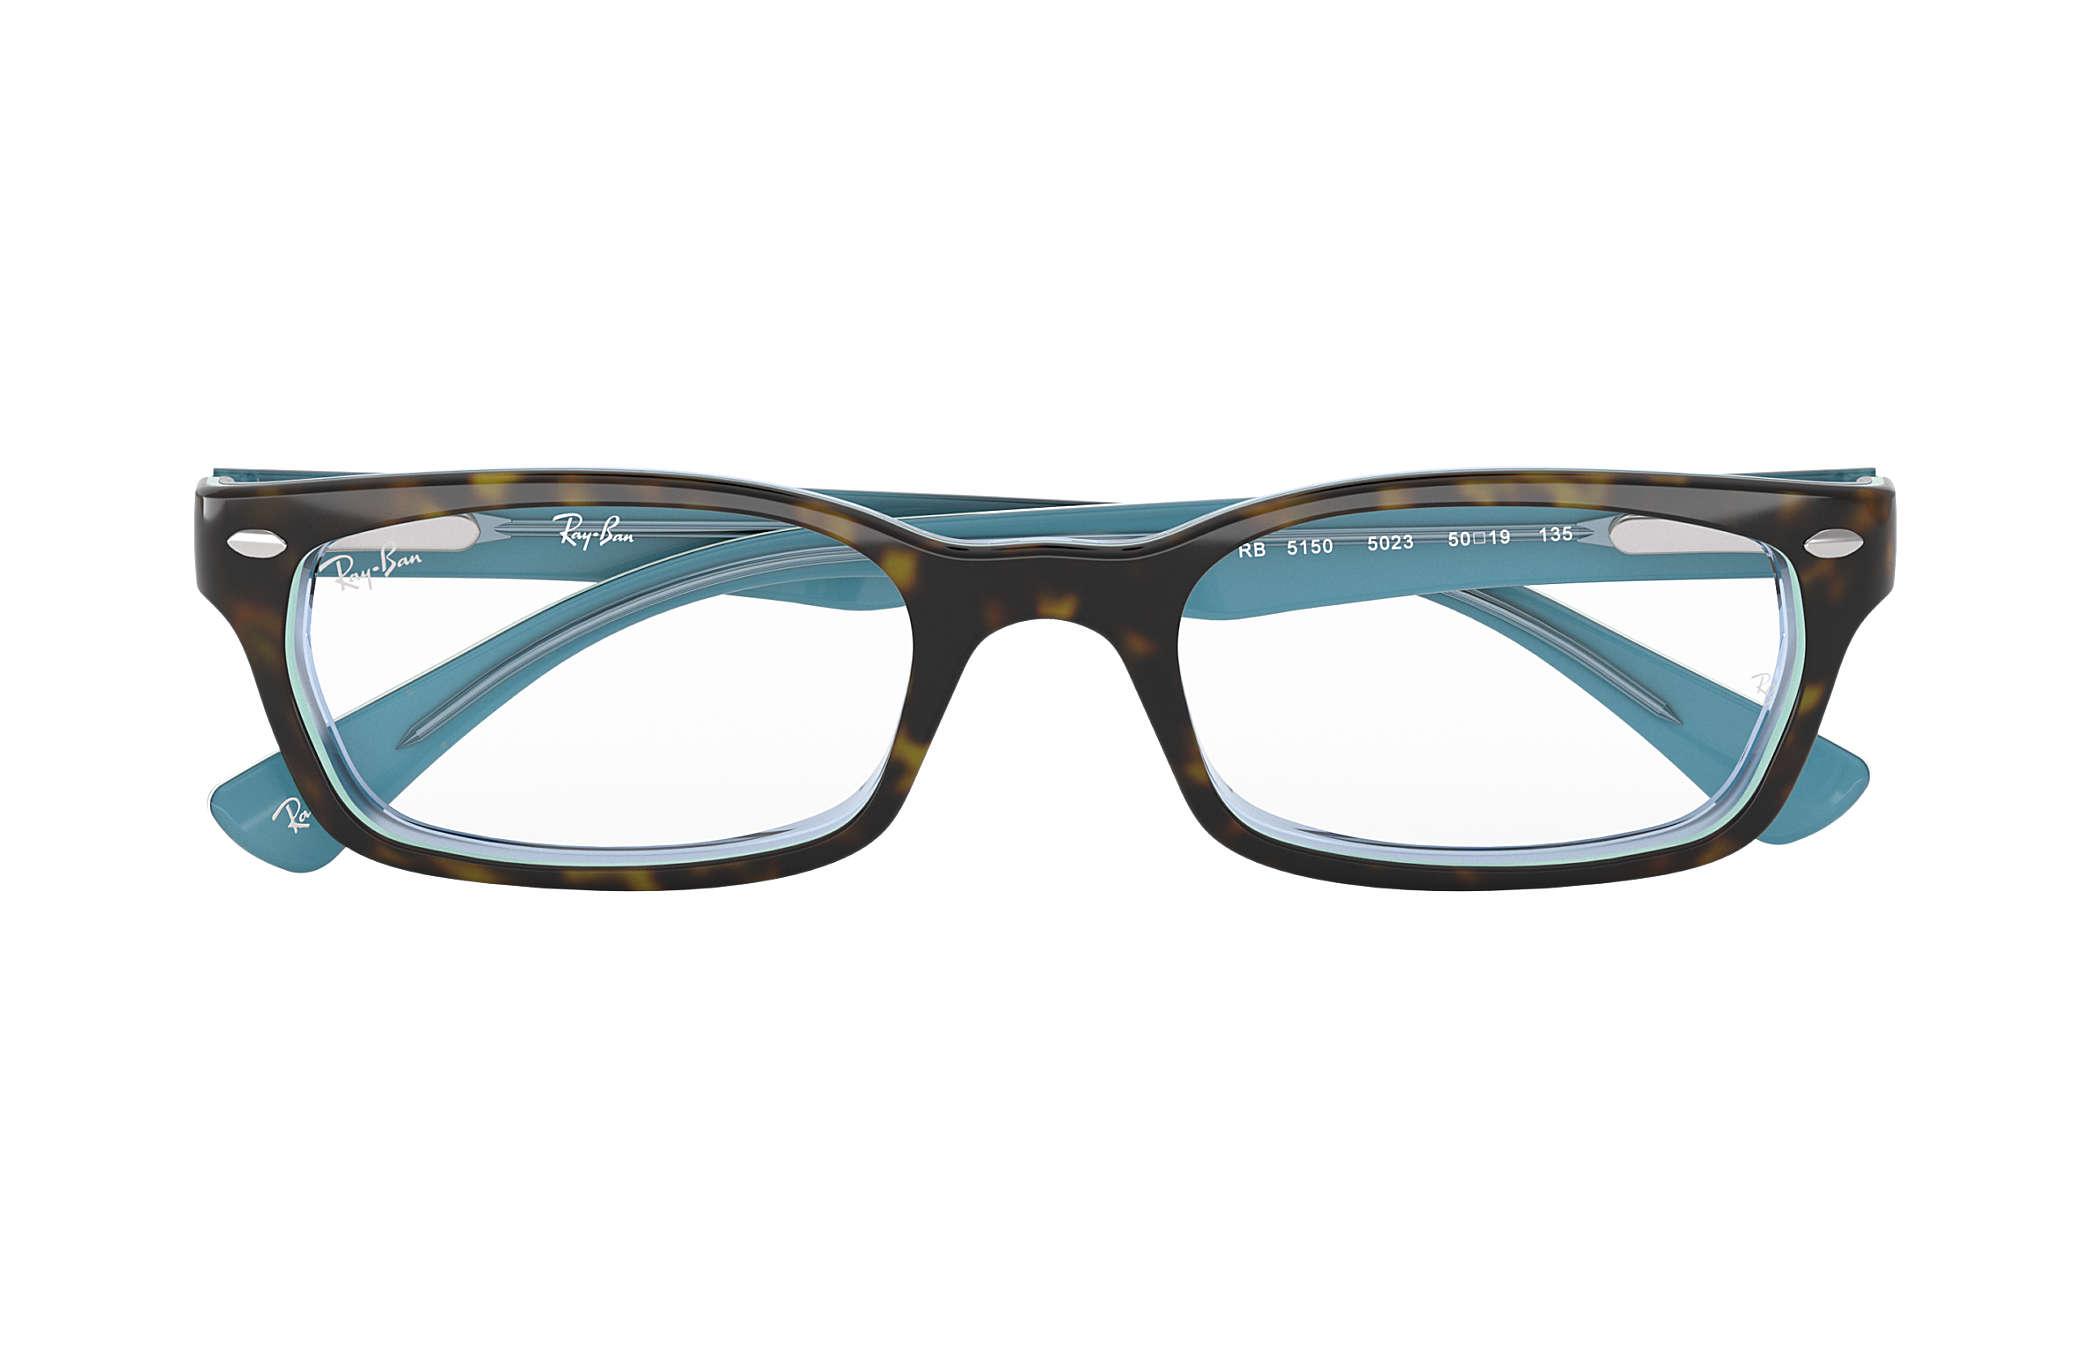 2e46818a578 Ray-Ban prescription glasses RB5150 Tortoise - Acetate ...